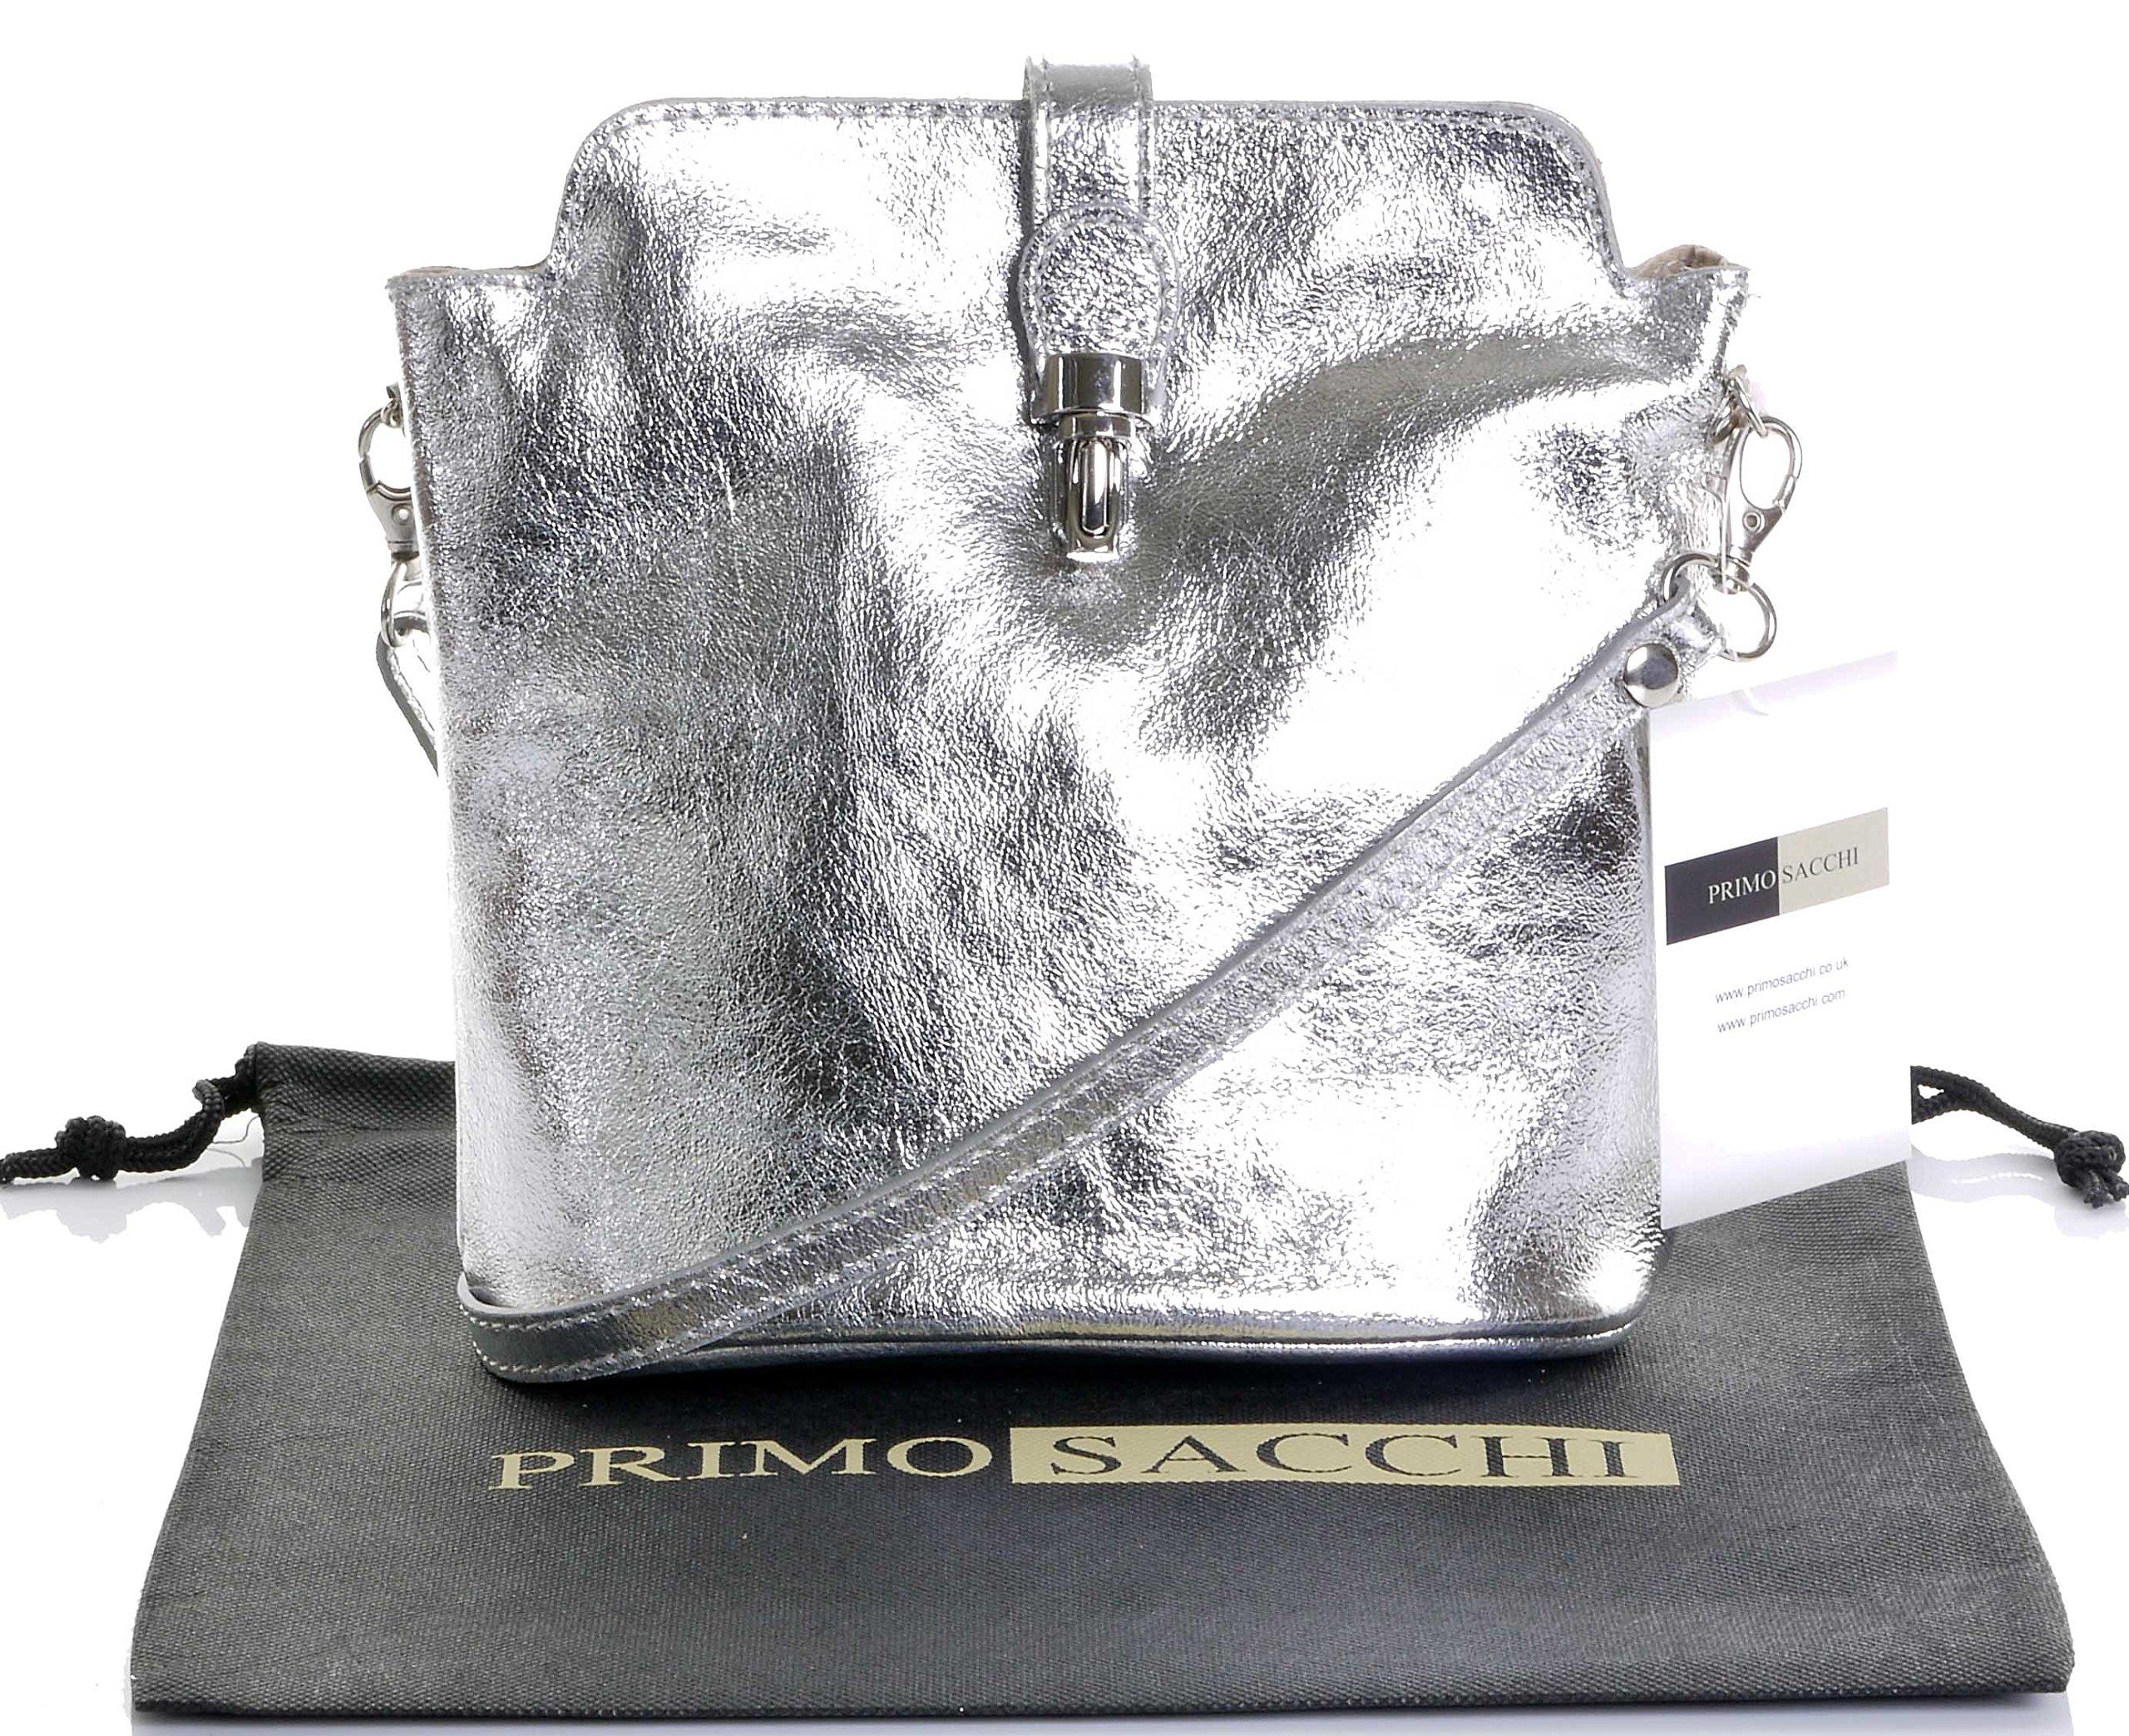 Primo Sacchi Italian Soft Leather Hand Made Small Silver Cross Body or Shoulder Bag Handbag